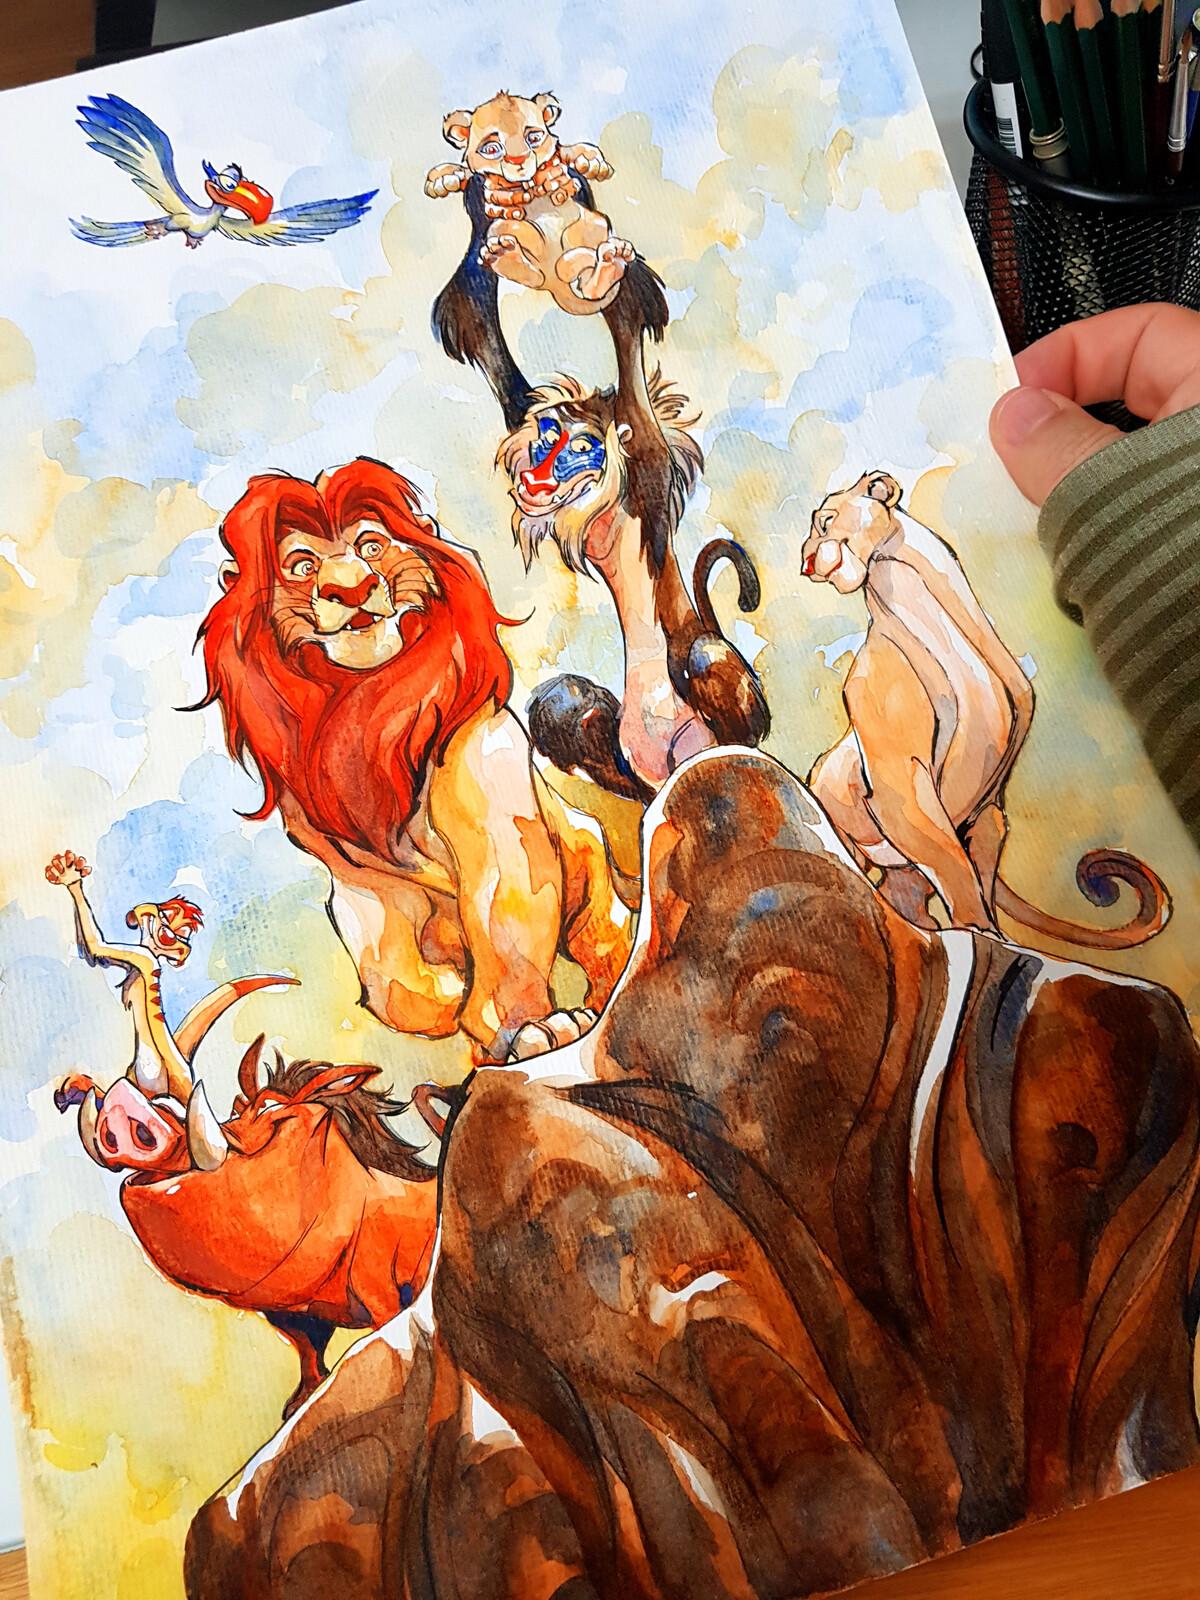 Watercolour, The Lion King